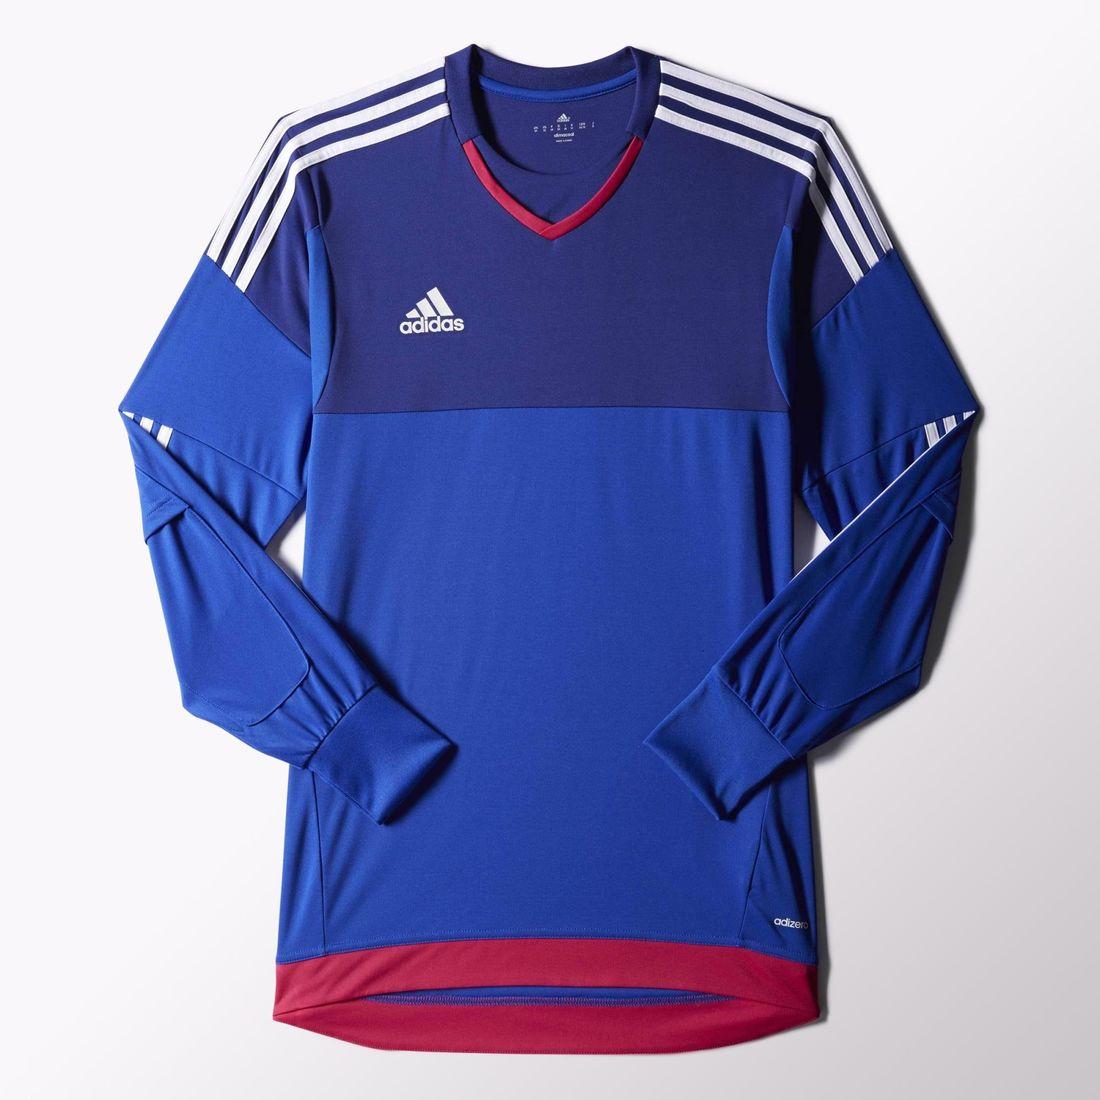 Adidas Top 15 Adult Goalkeeper Jersey Soccer Premier